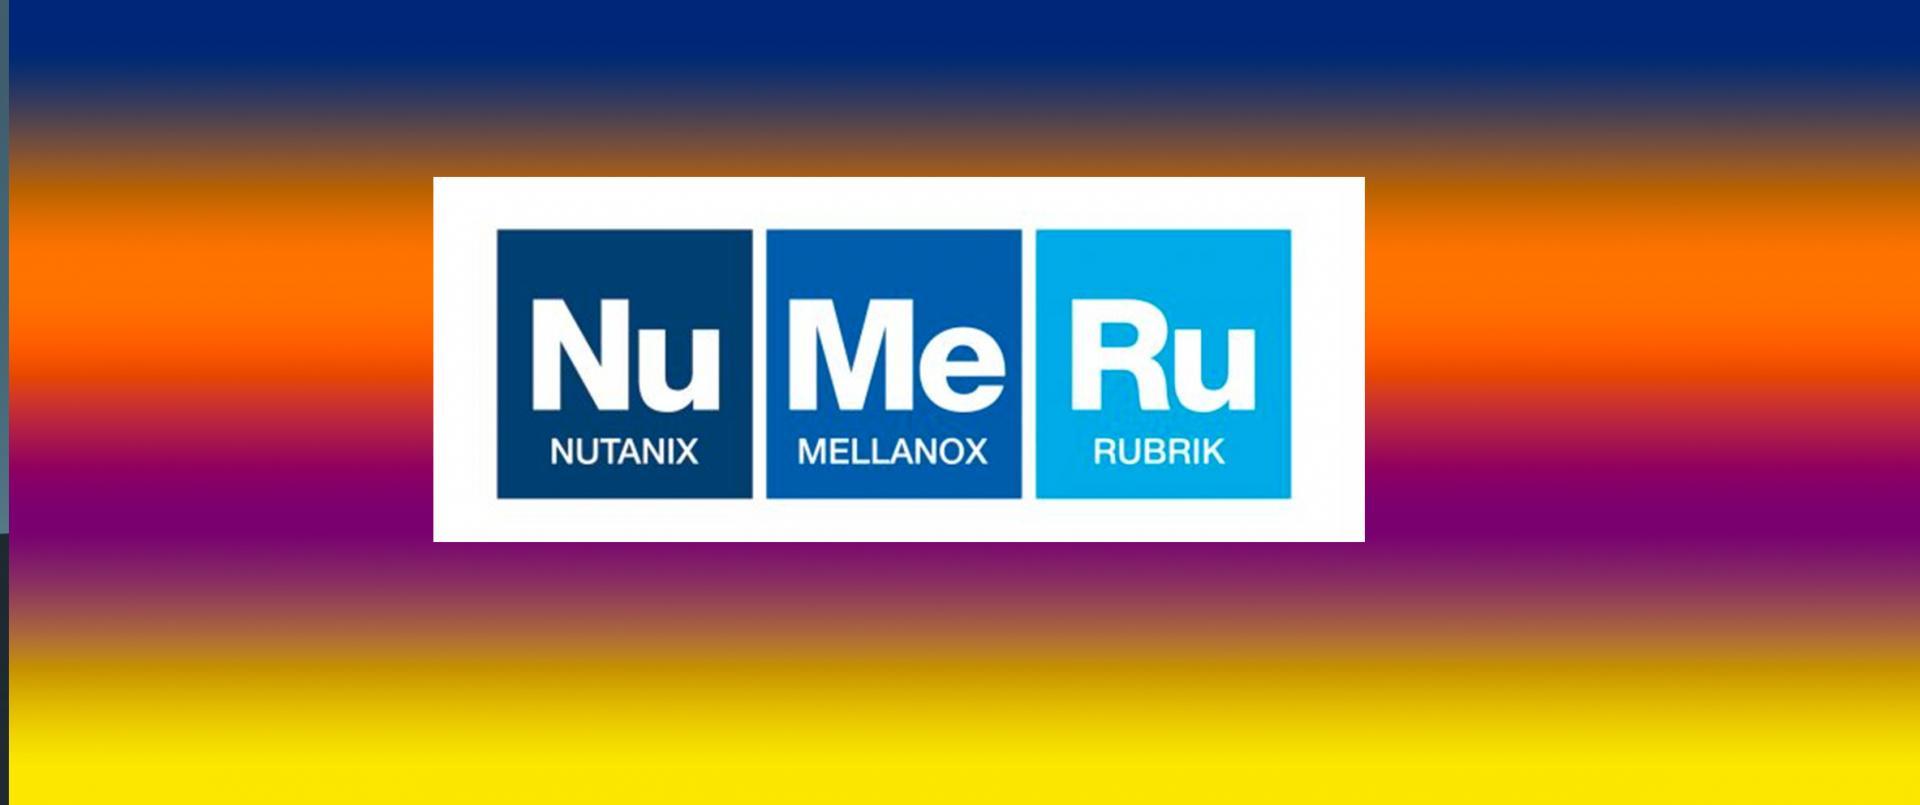 Exclusive Networks e BigTec presentano NuMeRu